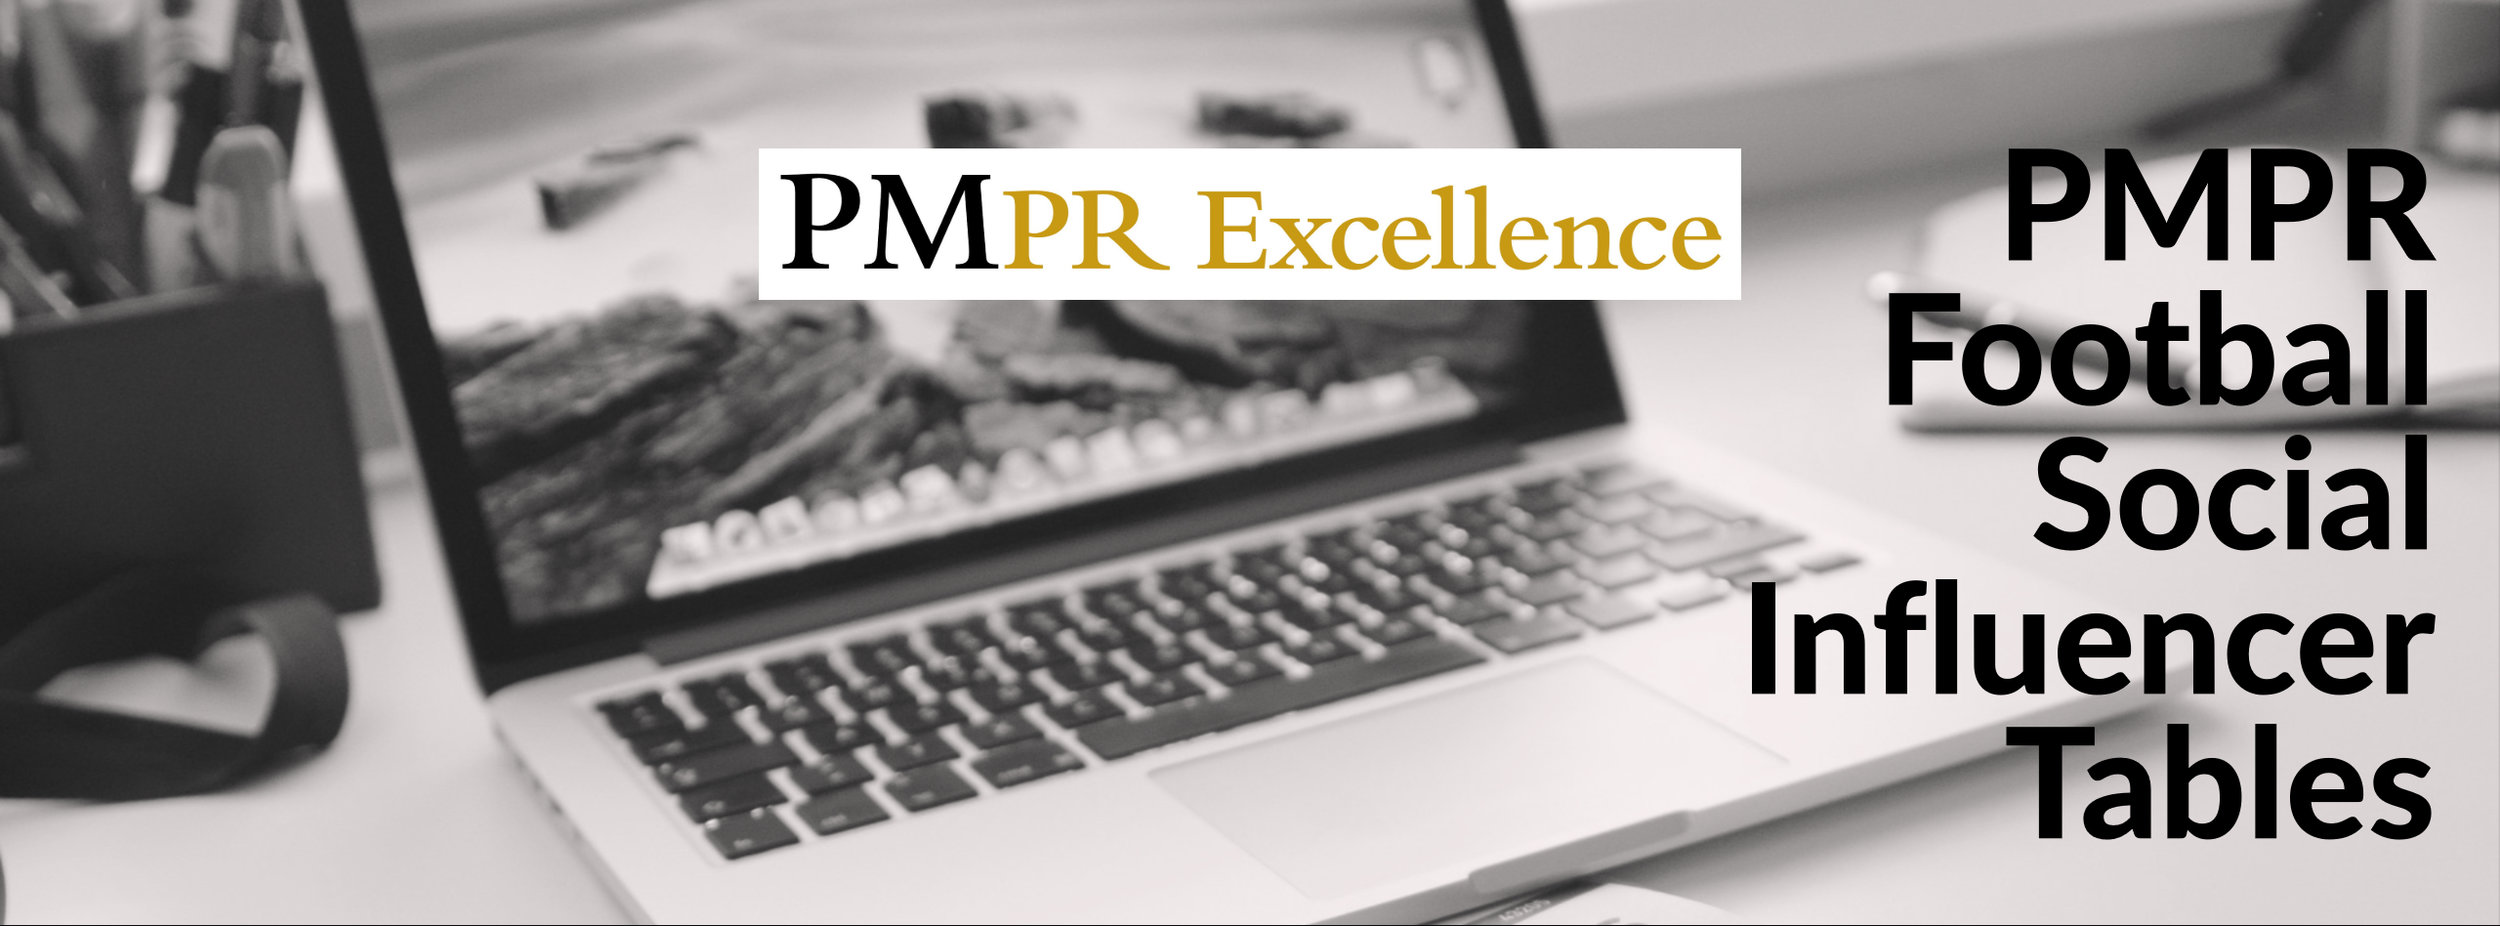 PMPR Football Social Influencer.jpg